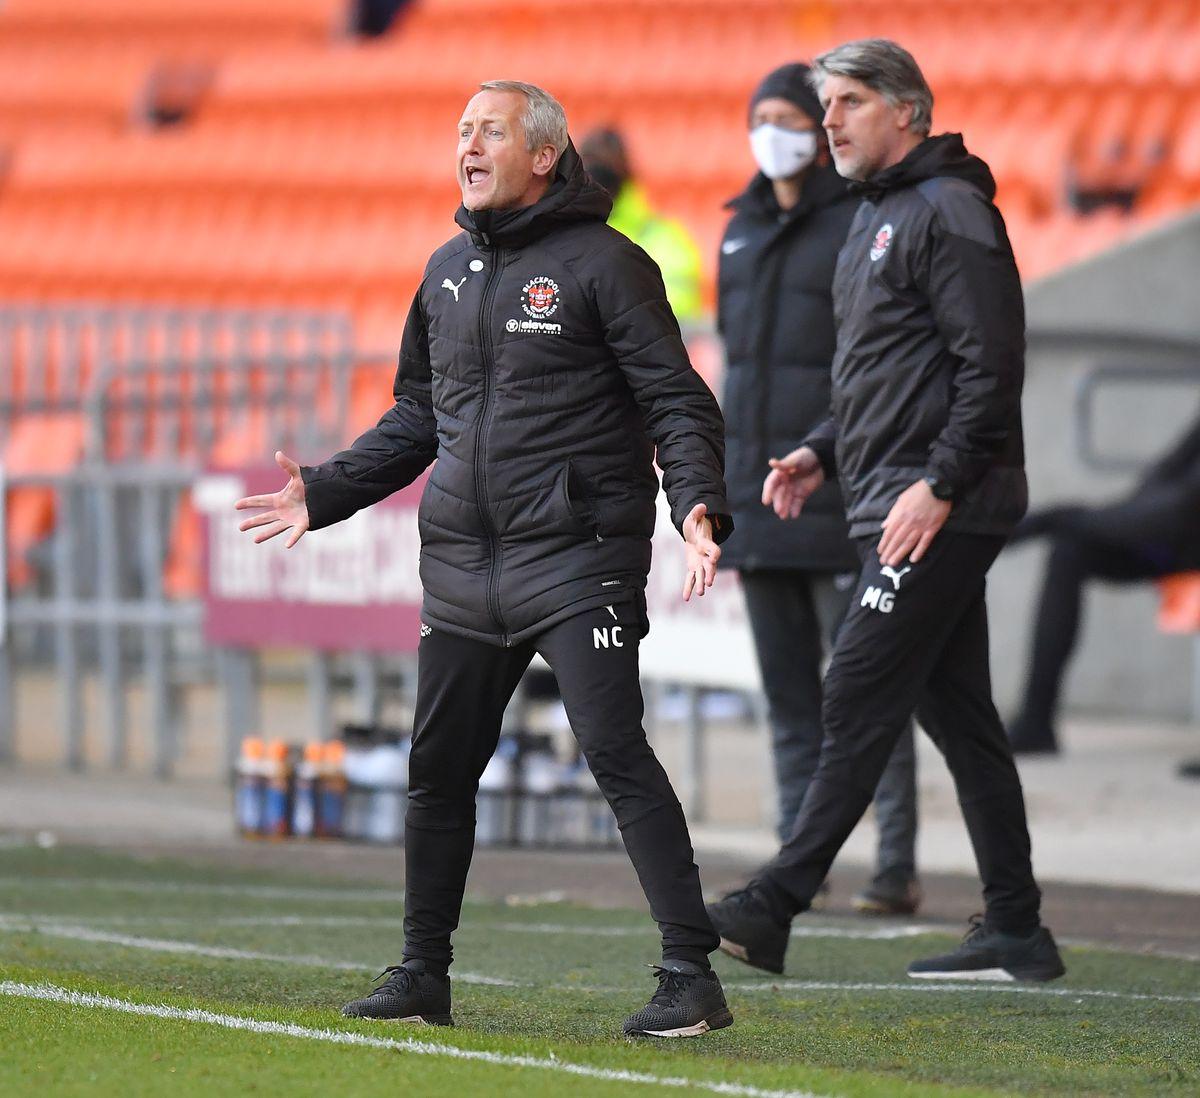 Blackpool v Accrington Stanley - Sky Bet League One